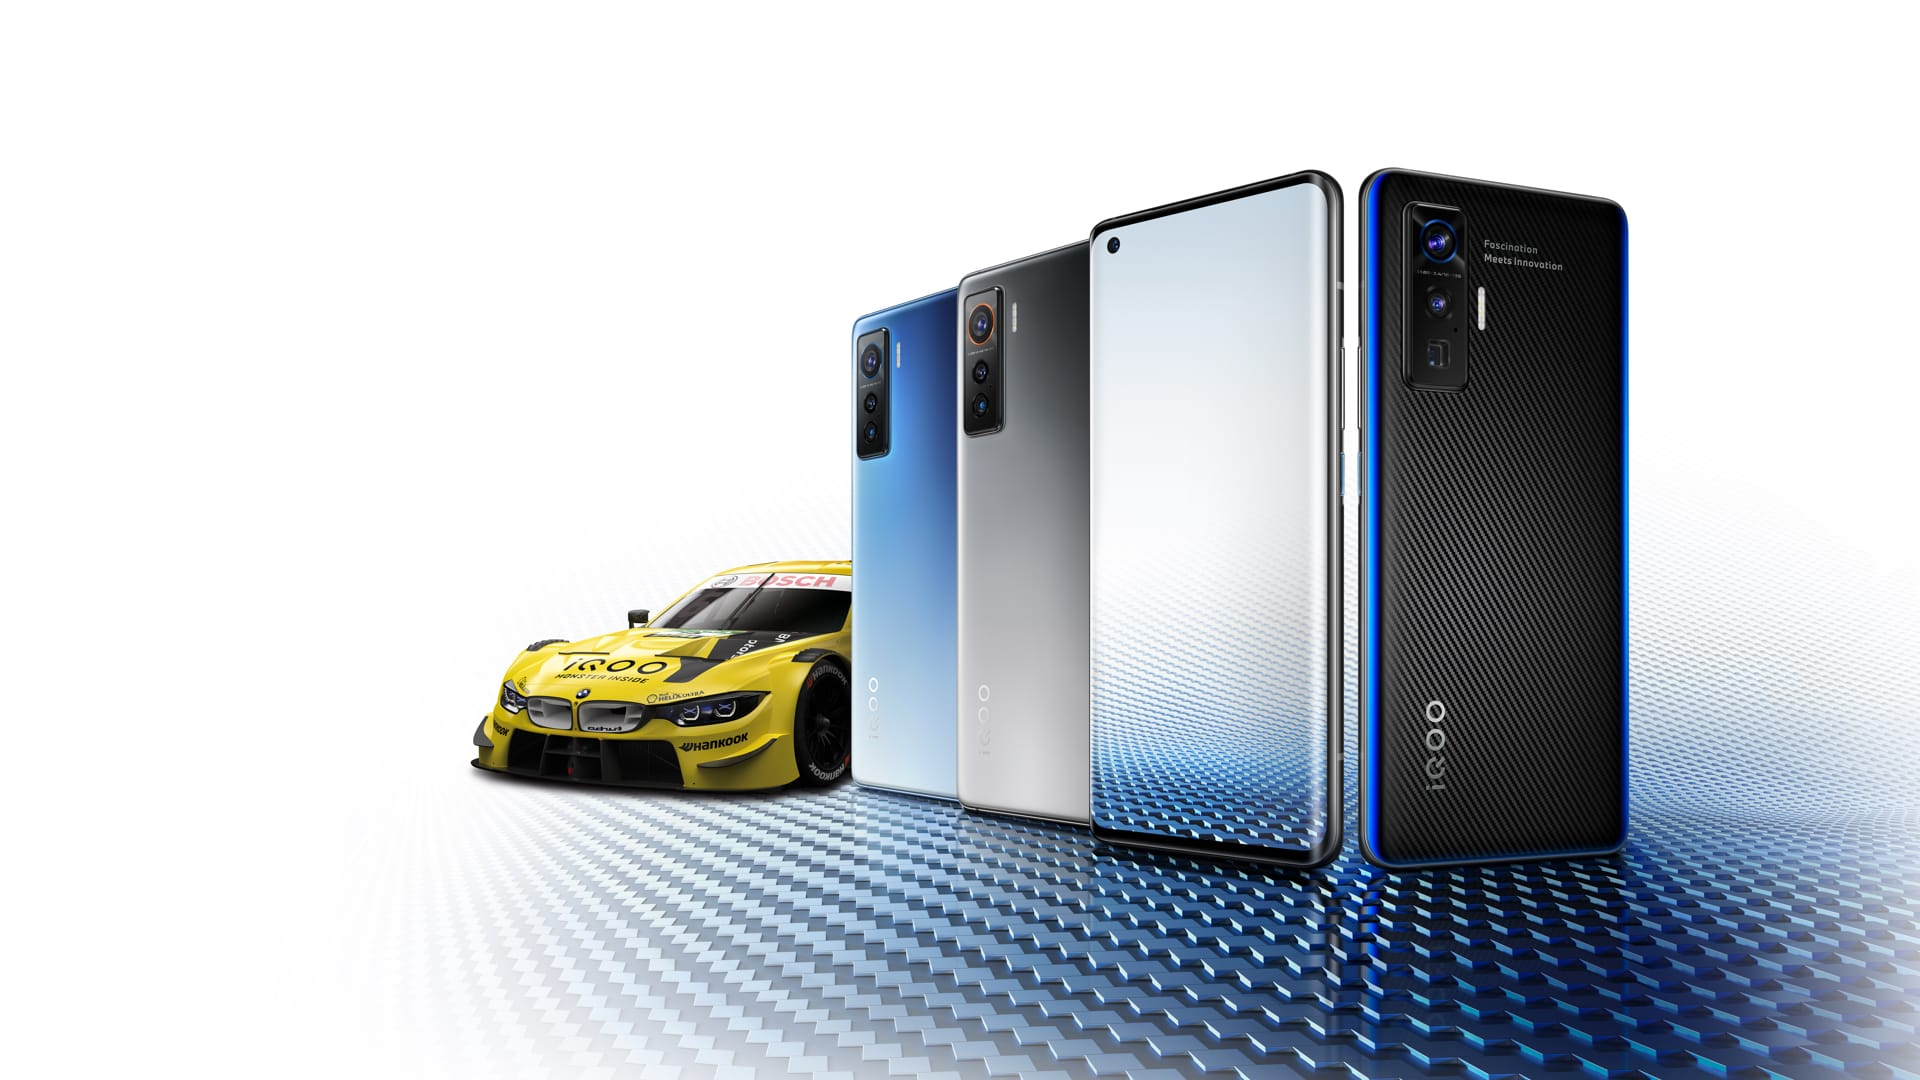 smartfon Vivo iQOO 5 Pro smartphone